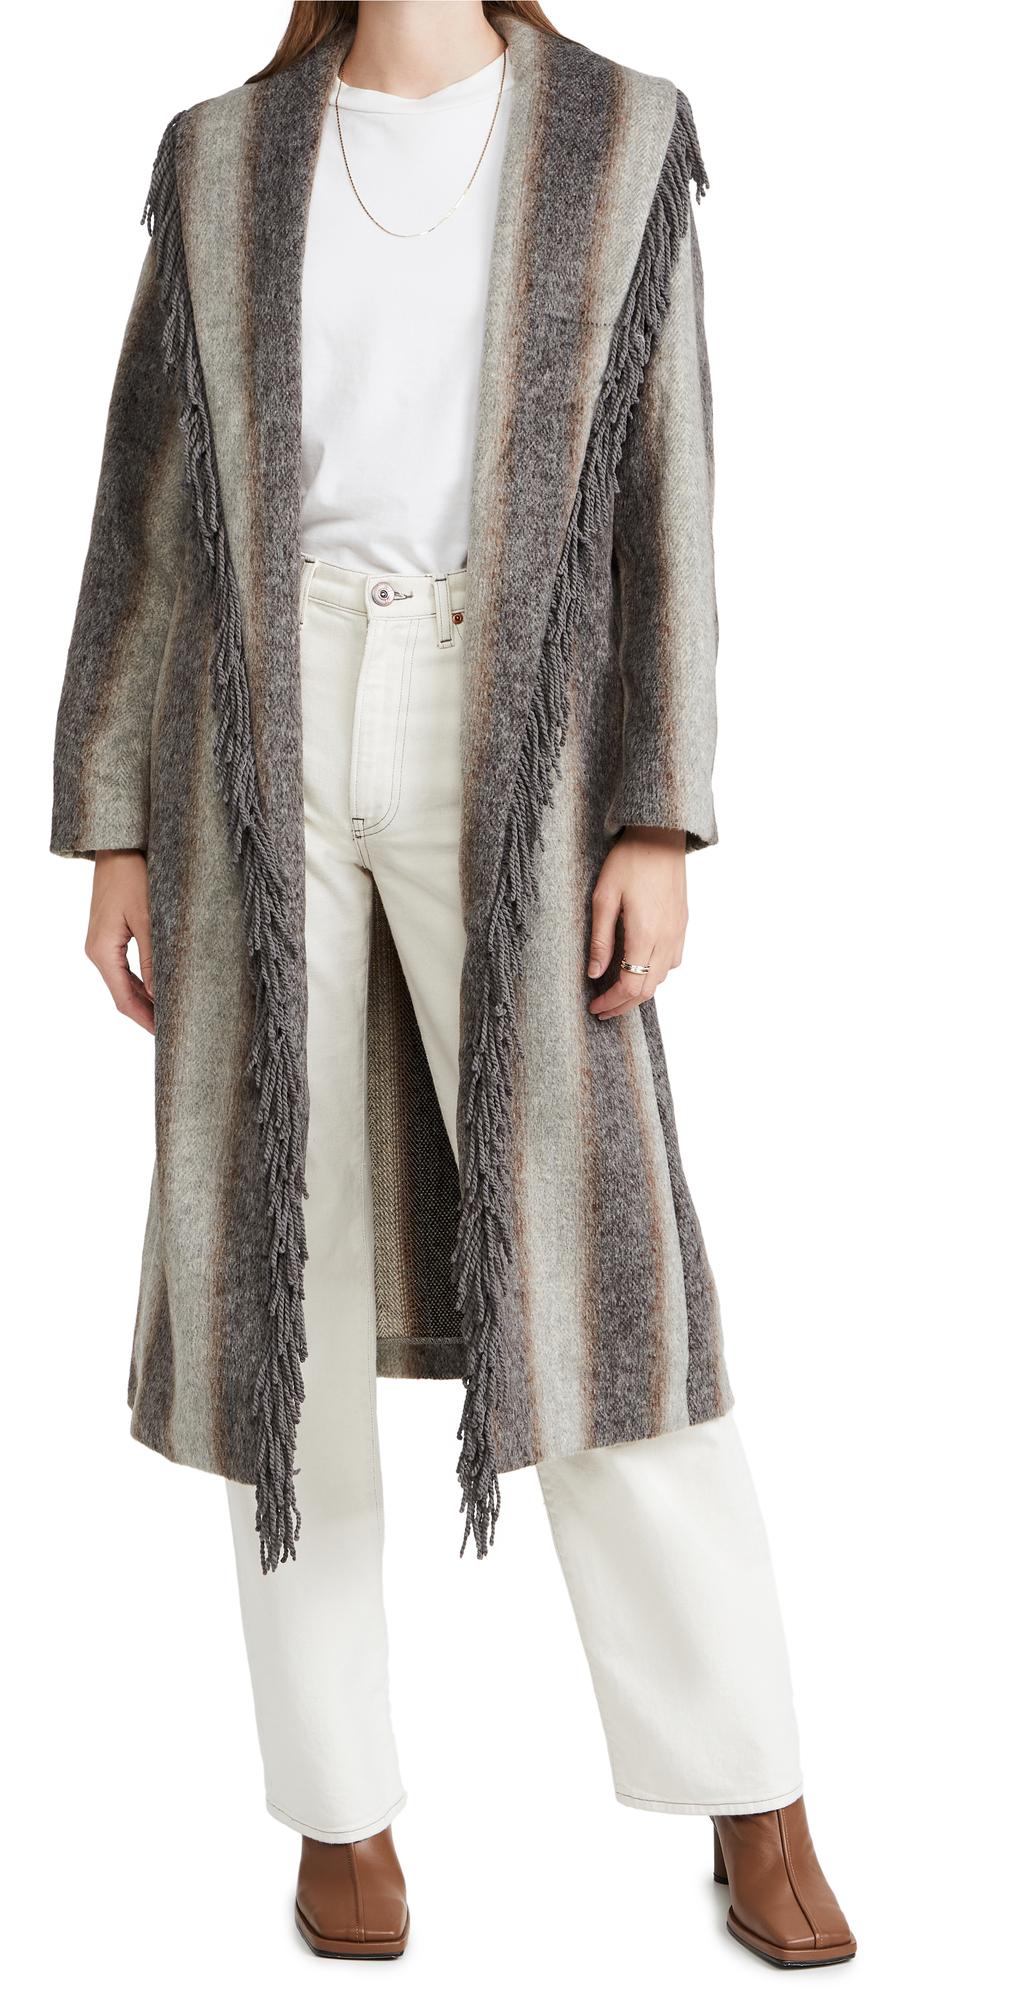 Linda Fringe Coat with Gradient Stripes